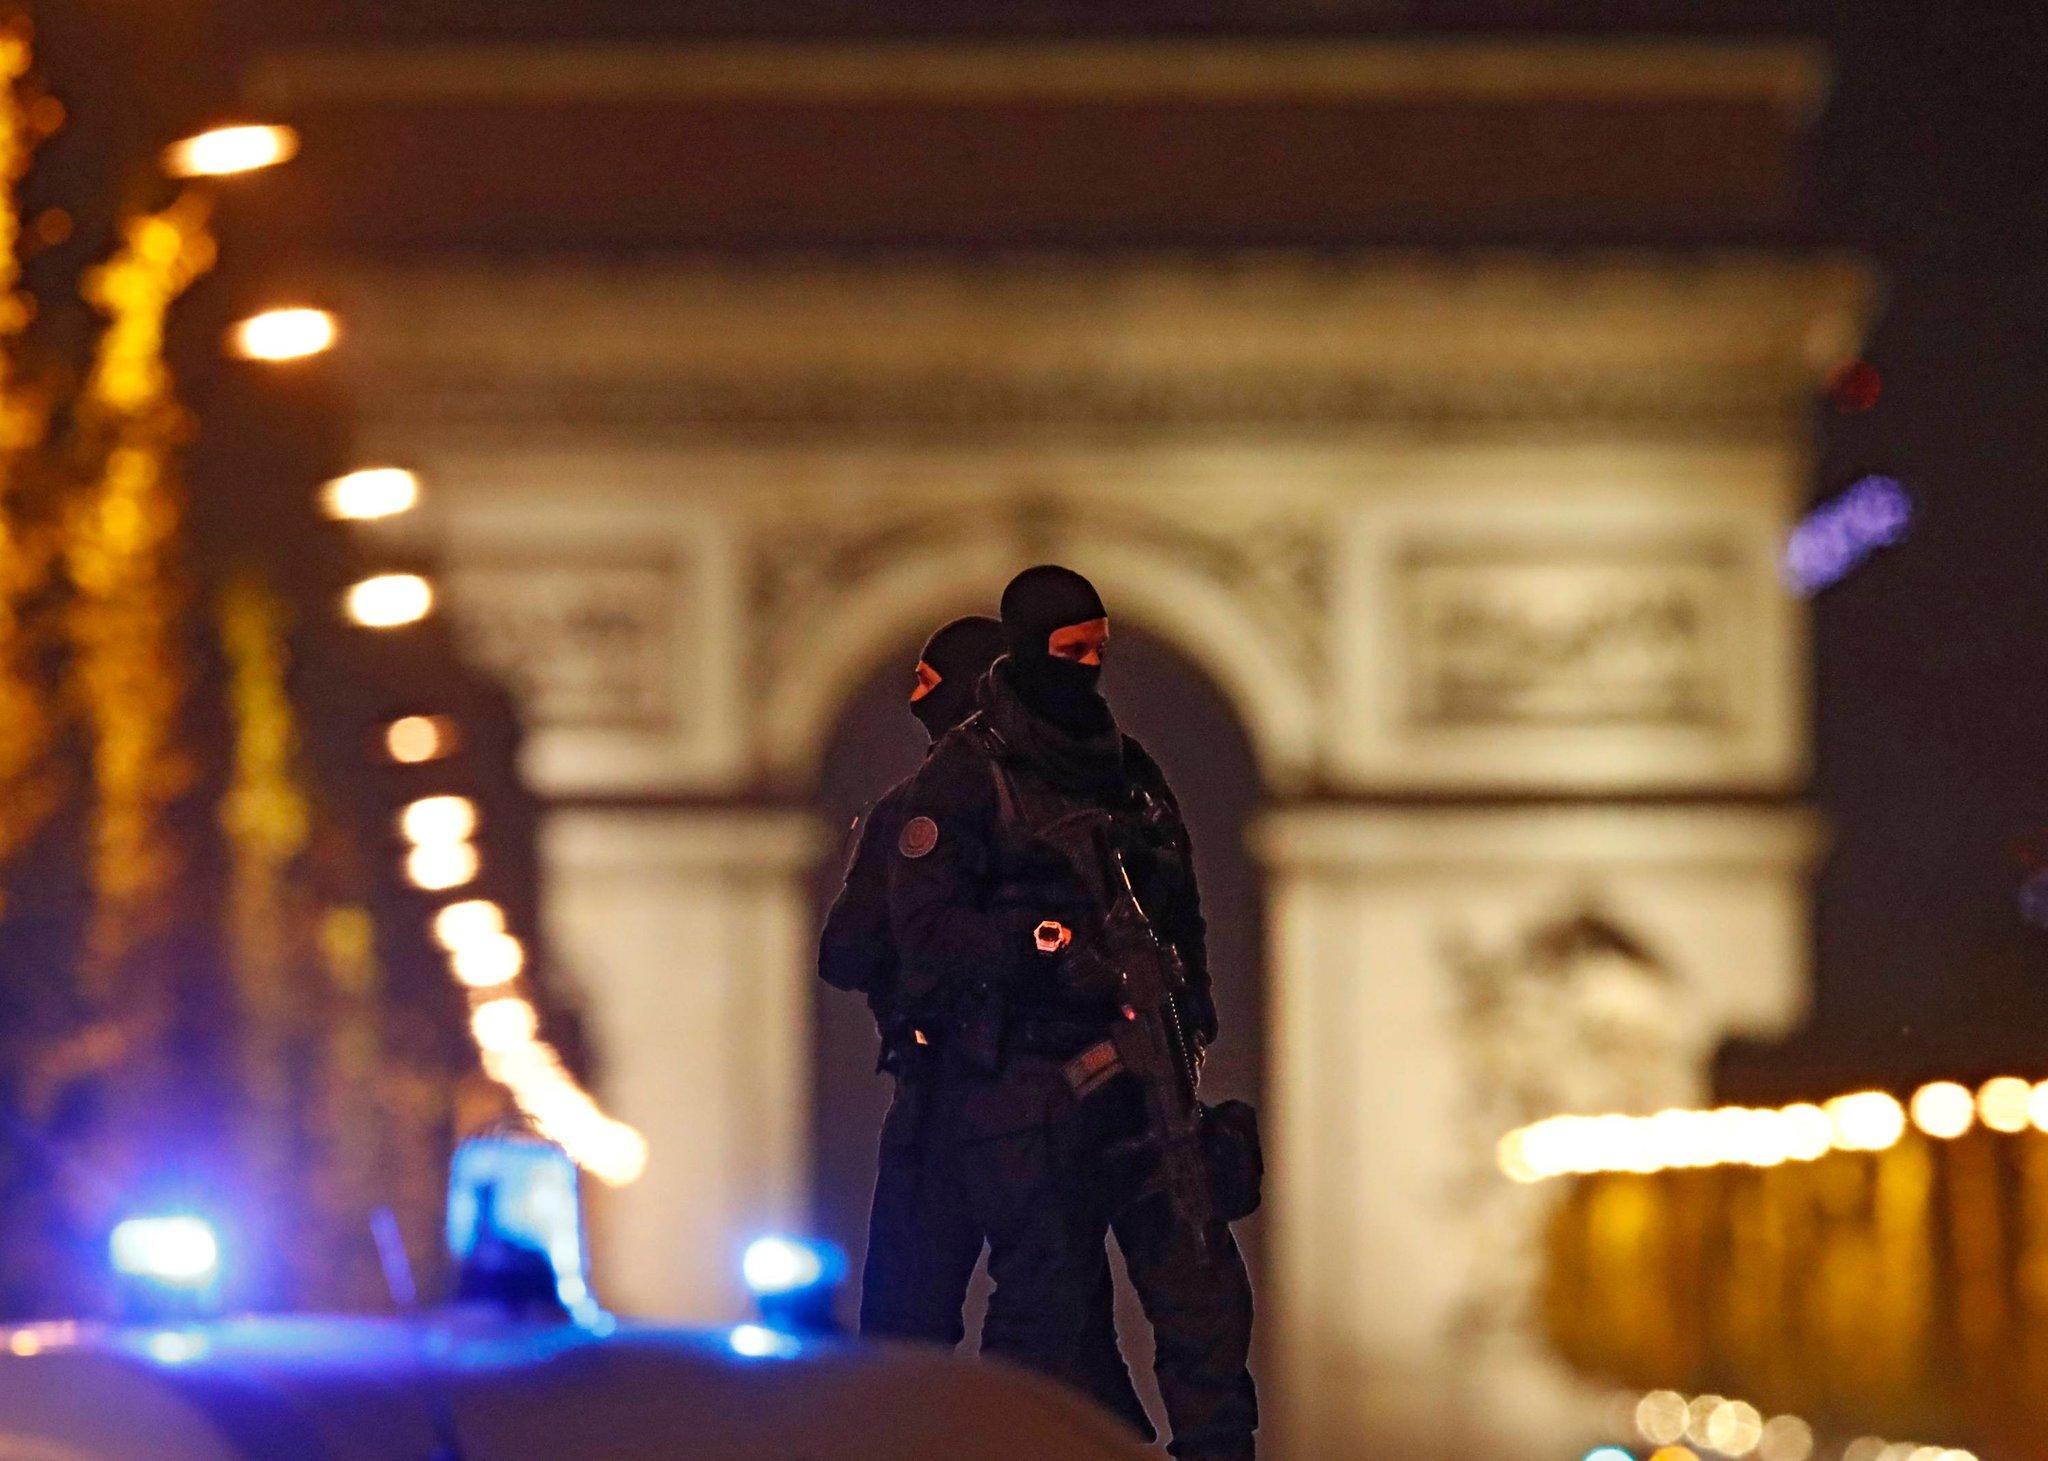 Нов терористички напад во Париз  Исламска држава ја презеде одговорноста